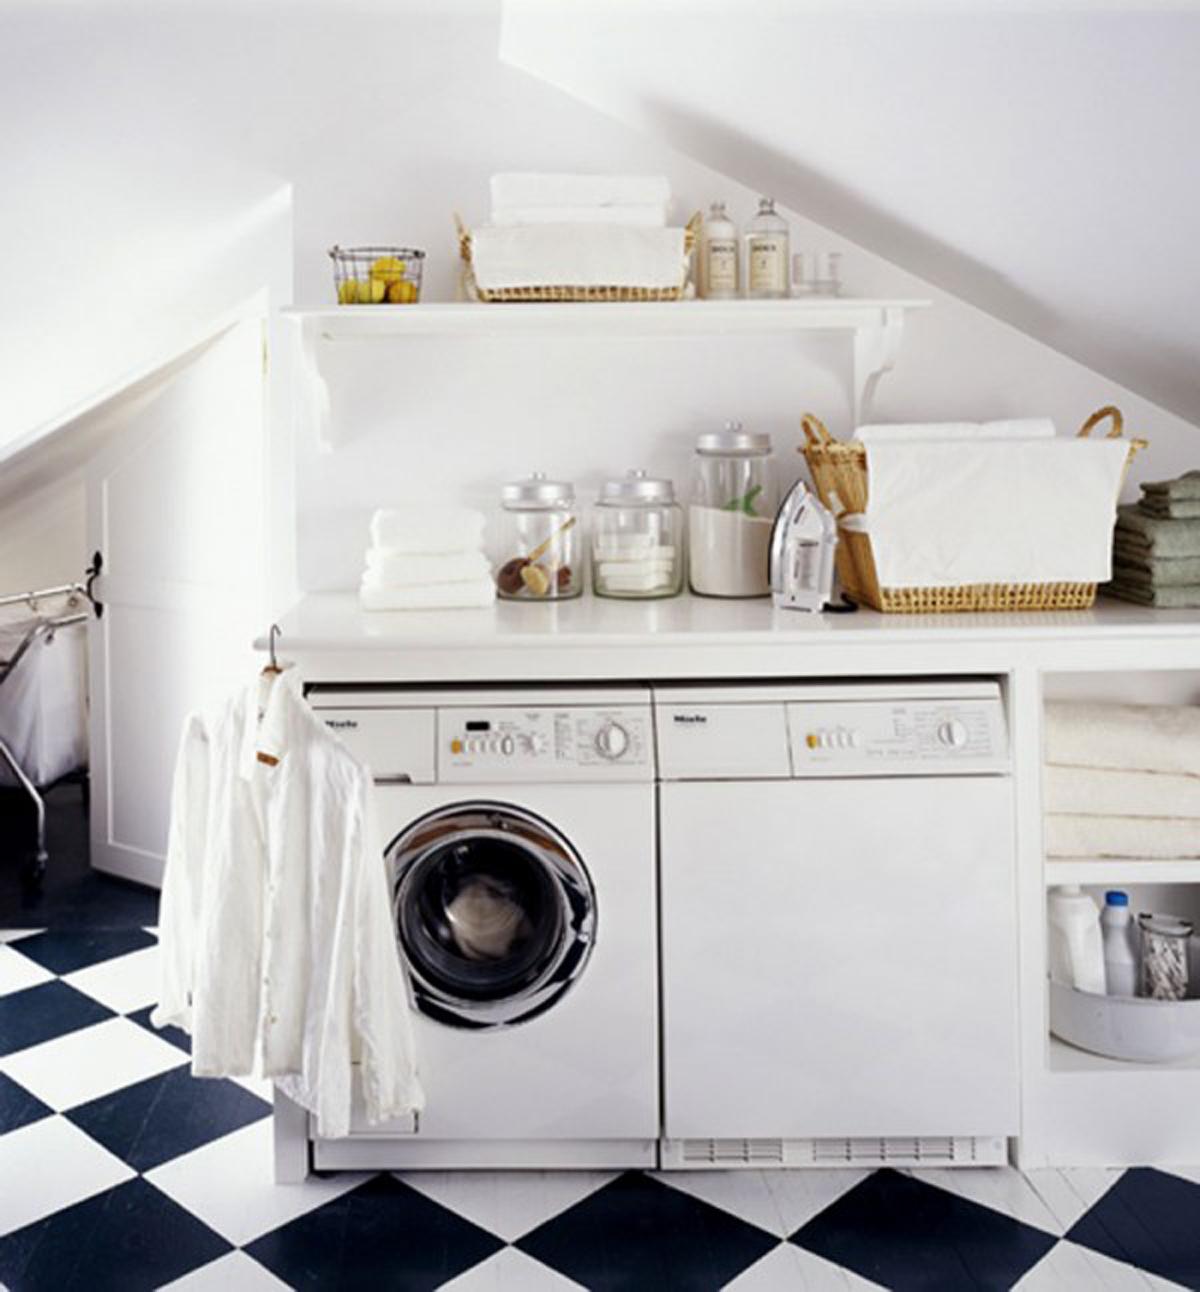 hunted interior laundry room inspirations. Black Bedroom Furniture Sets. Home Design Ideas